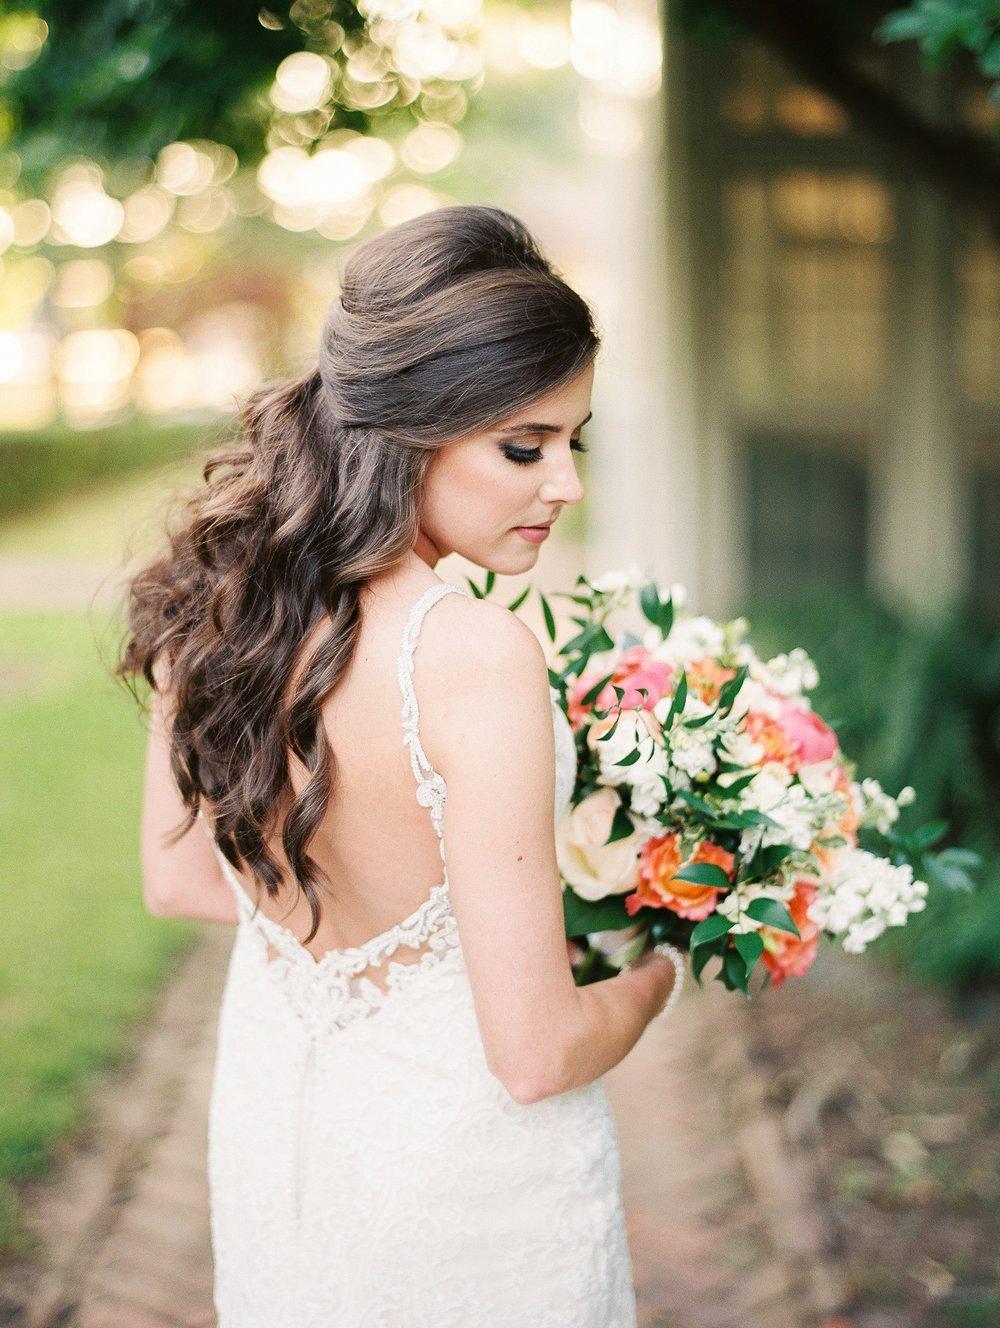 The-Terry-House-Wedding-Little-Rock-Arkansas_0070.jpg